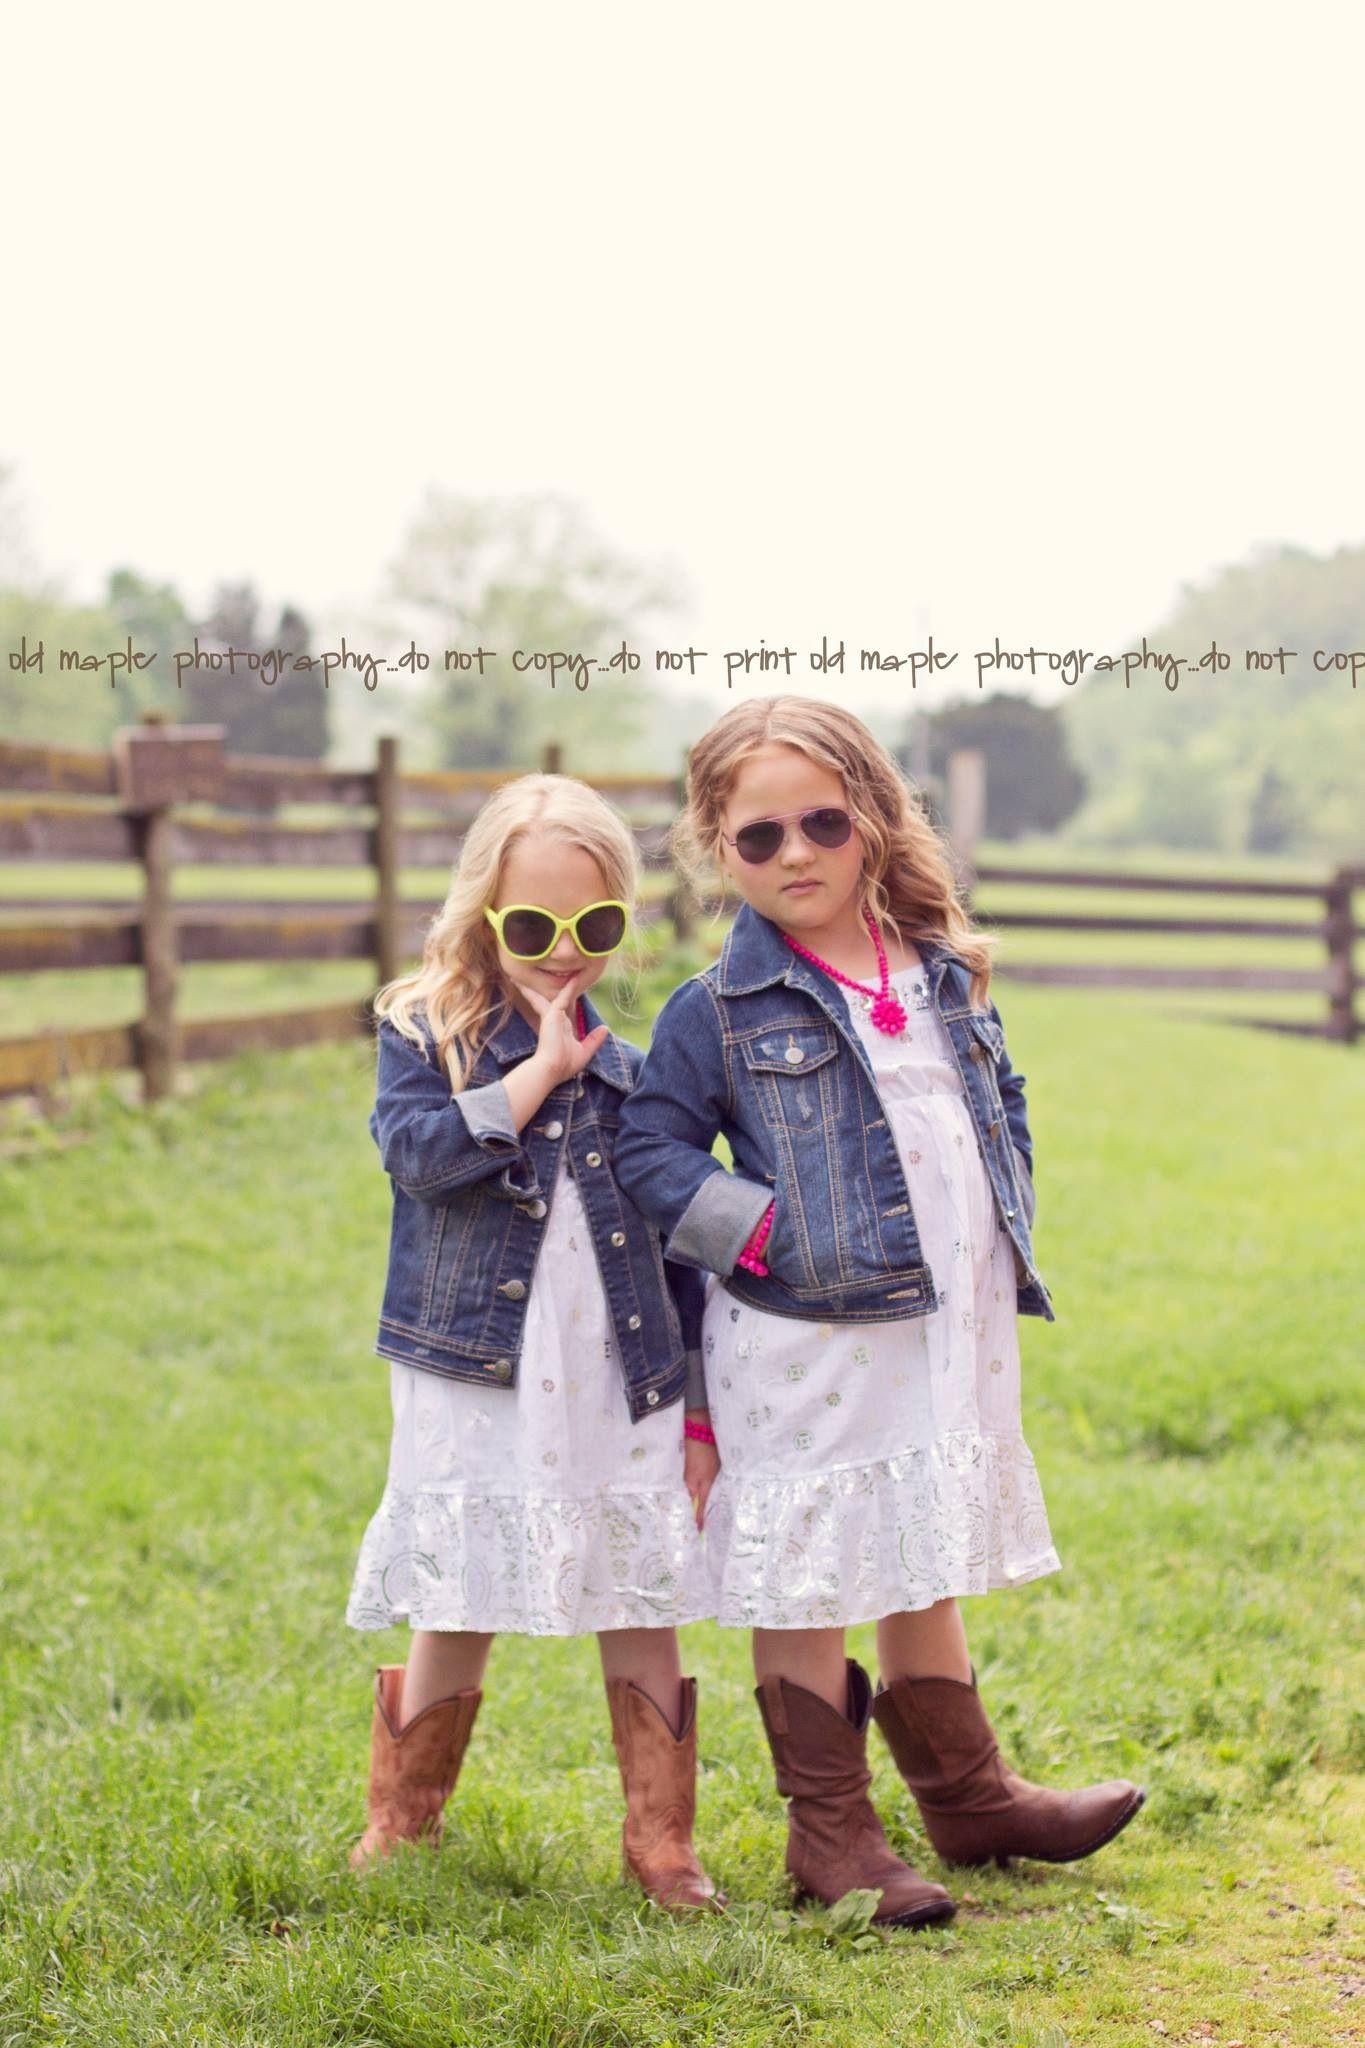 Best friend photo shoot | photo ideas | Pinterest